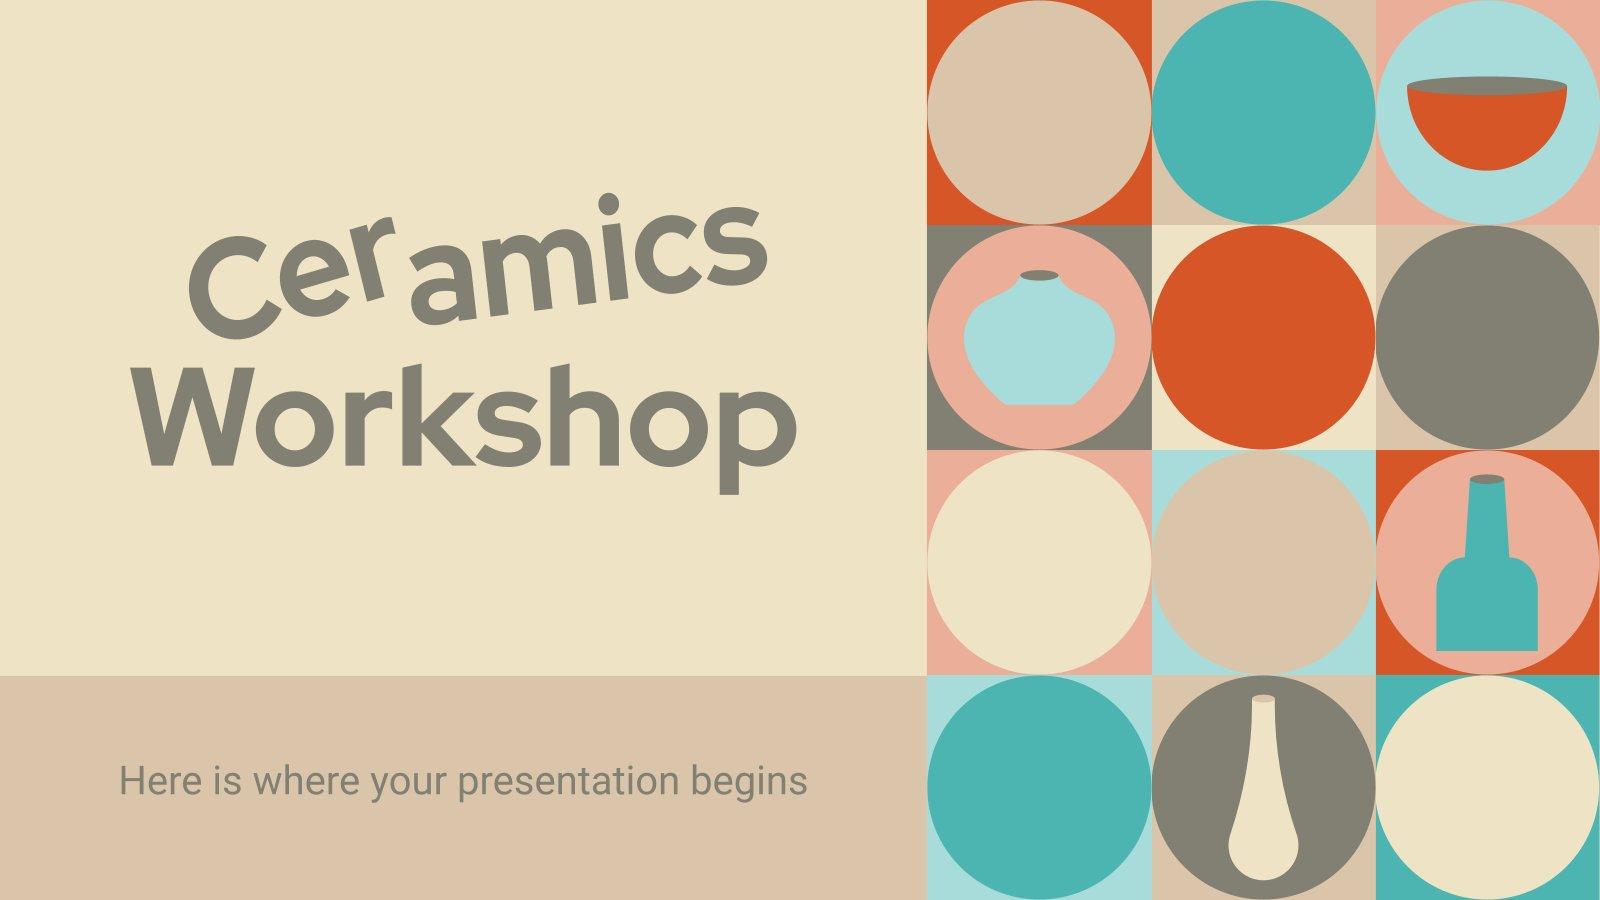 Ceramics Workshop presentation template